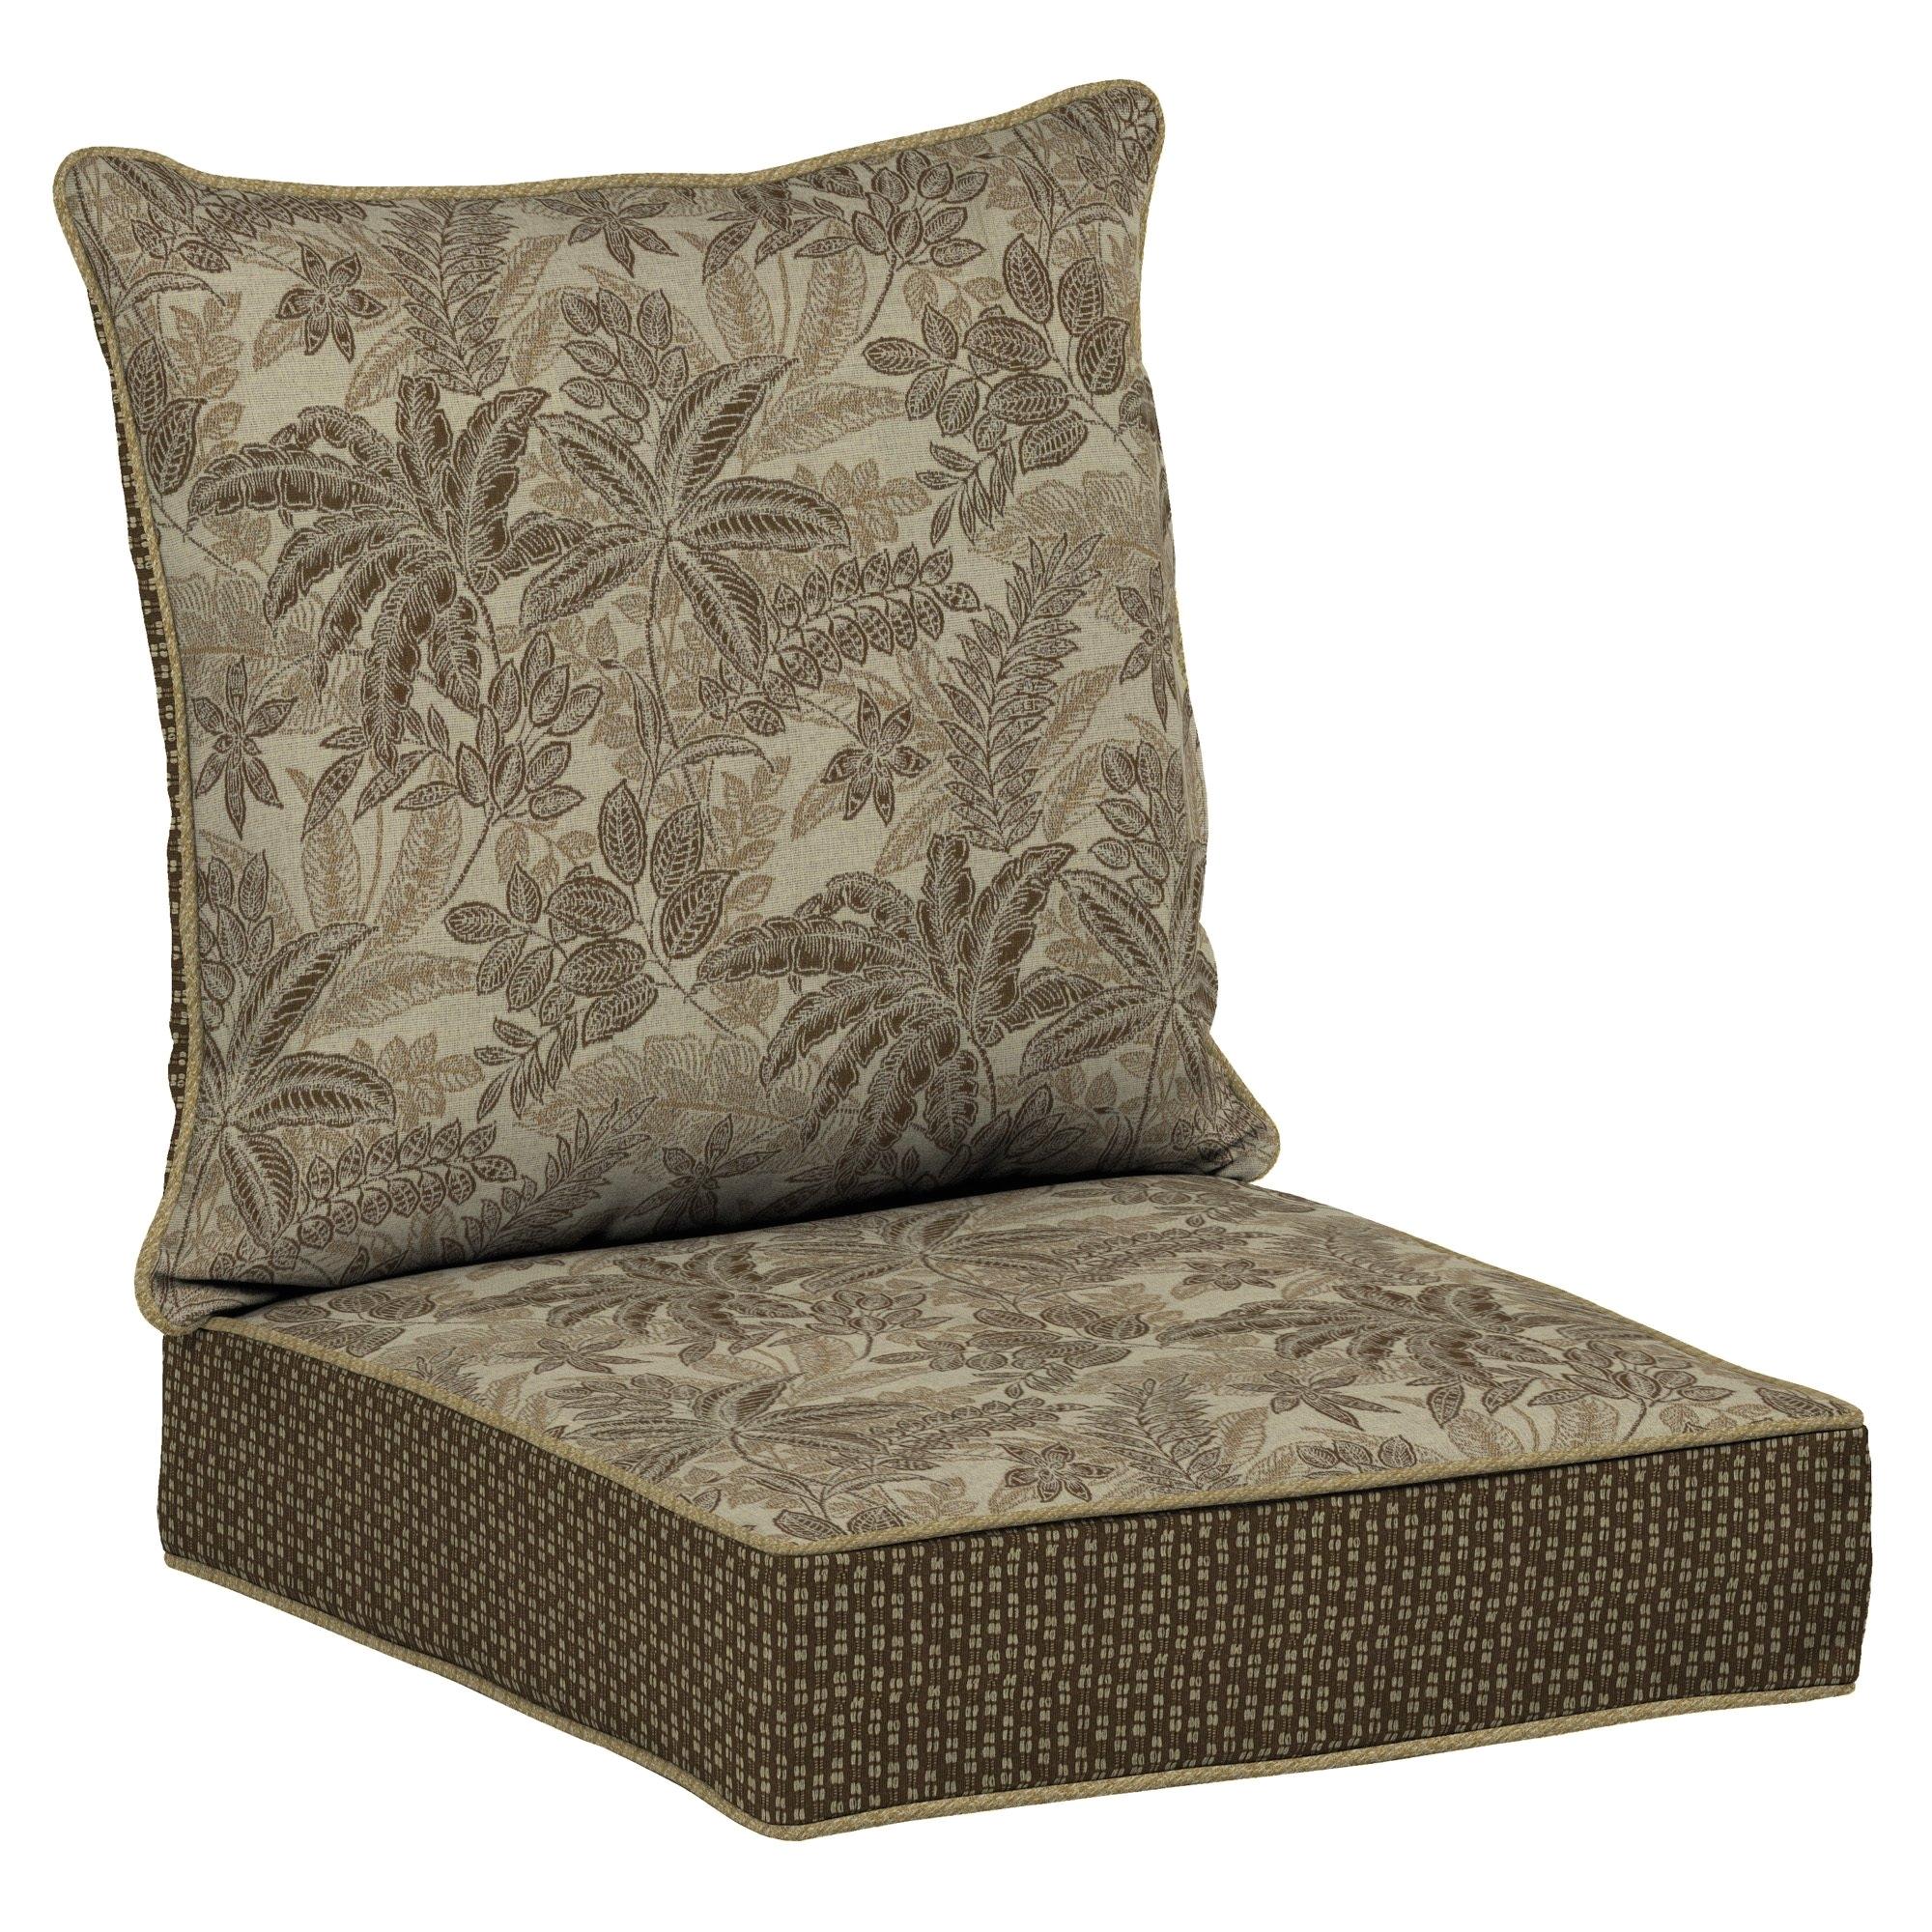 "shop bombaya outdoors palmetto mocha snap drya""¢ deep seat cushion set free shipping today overstock com 15273942"